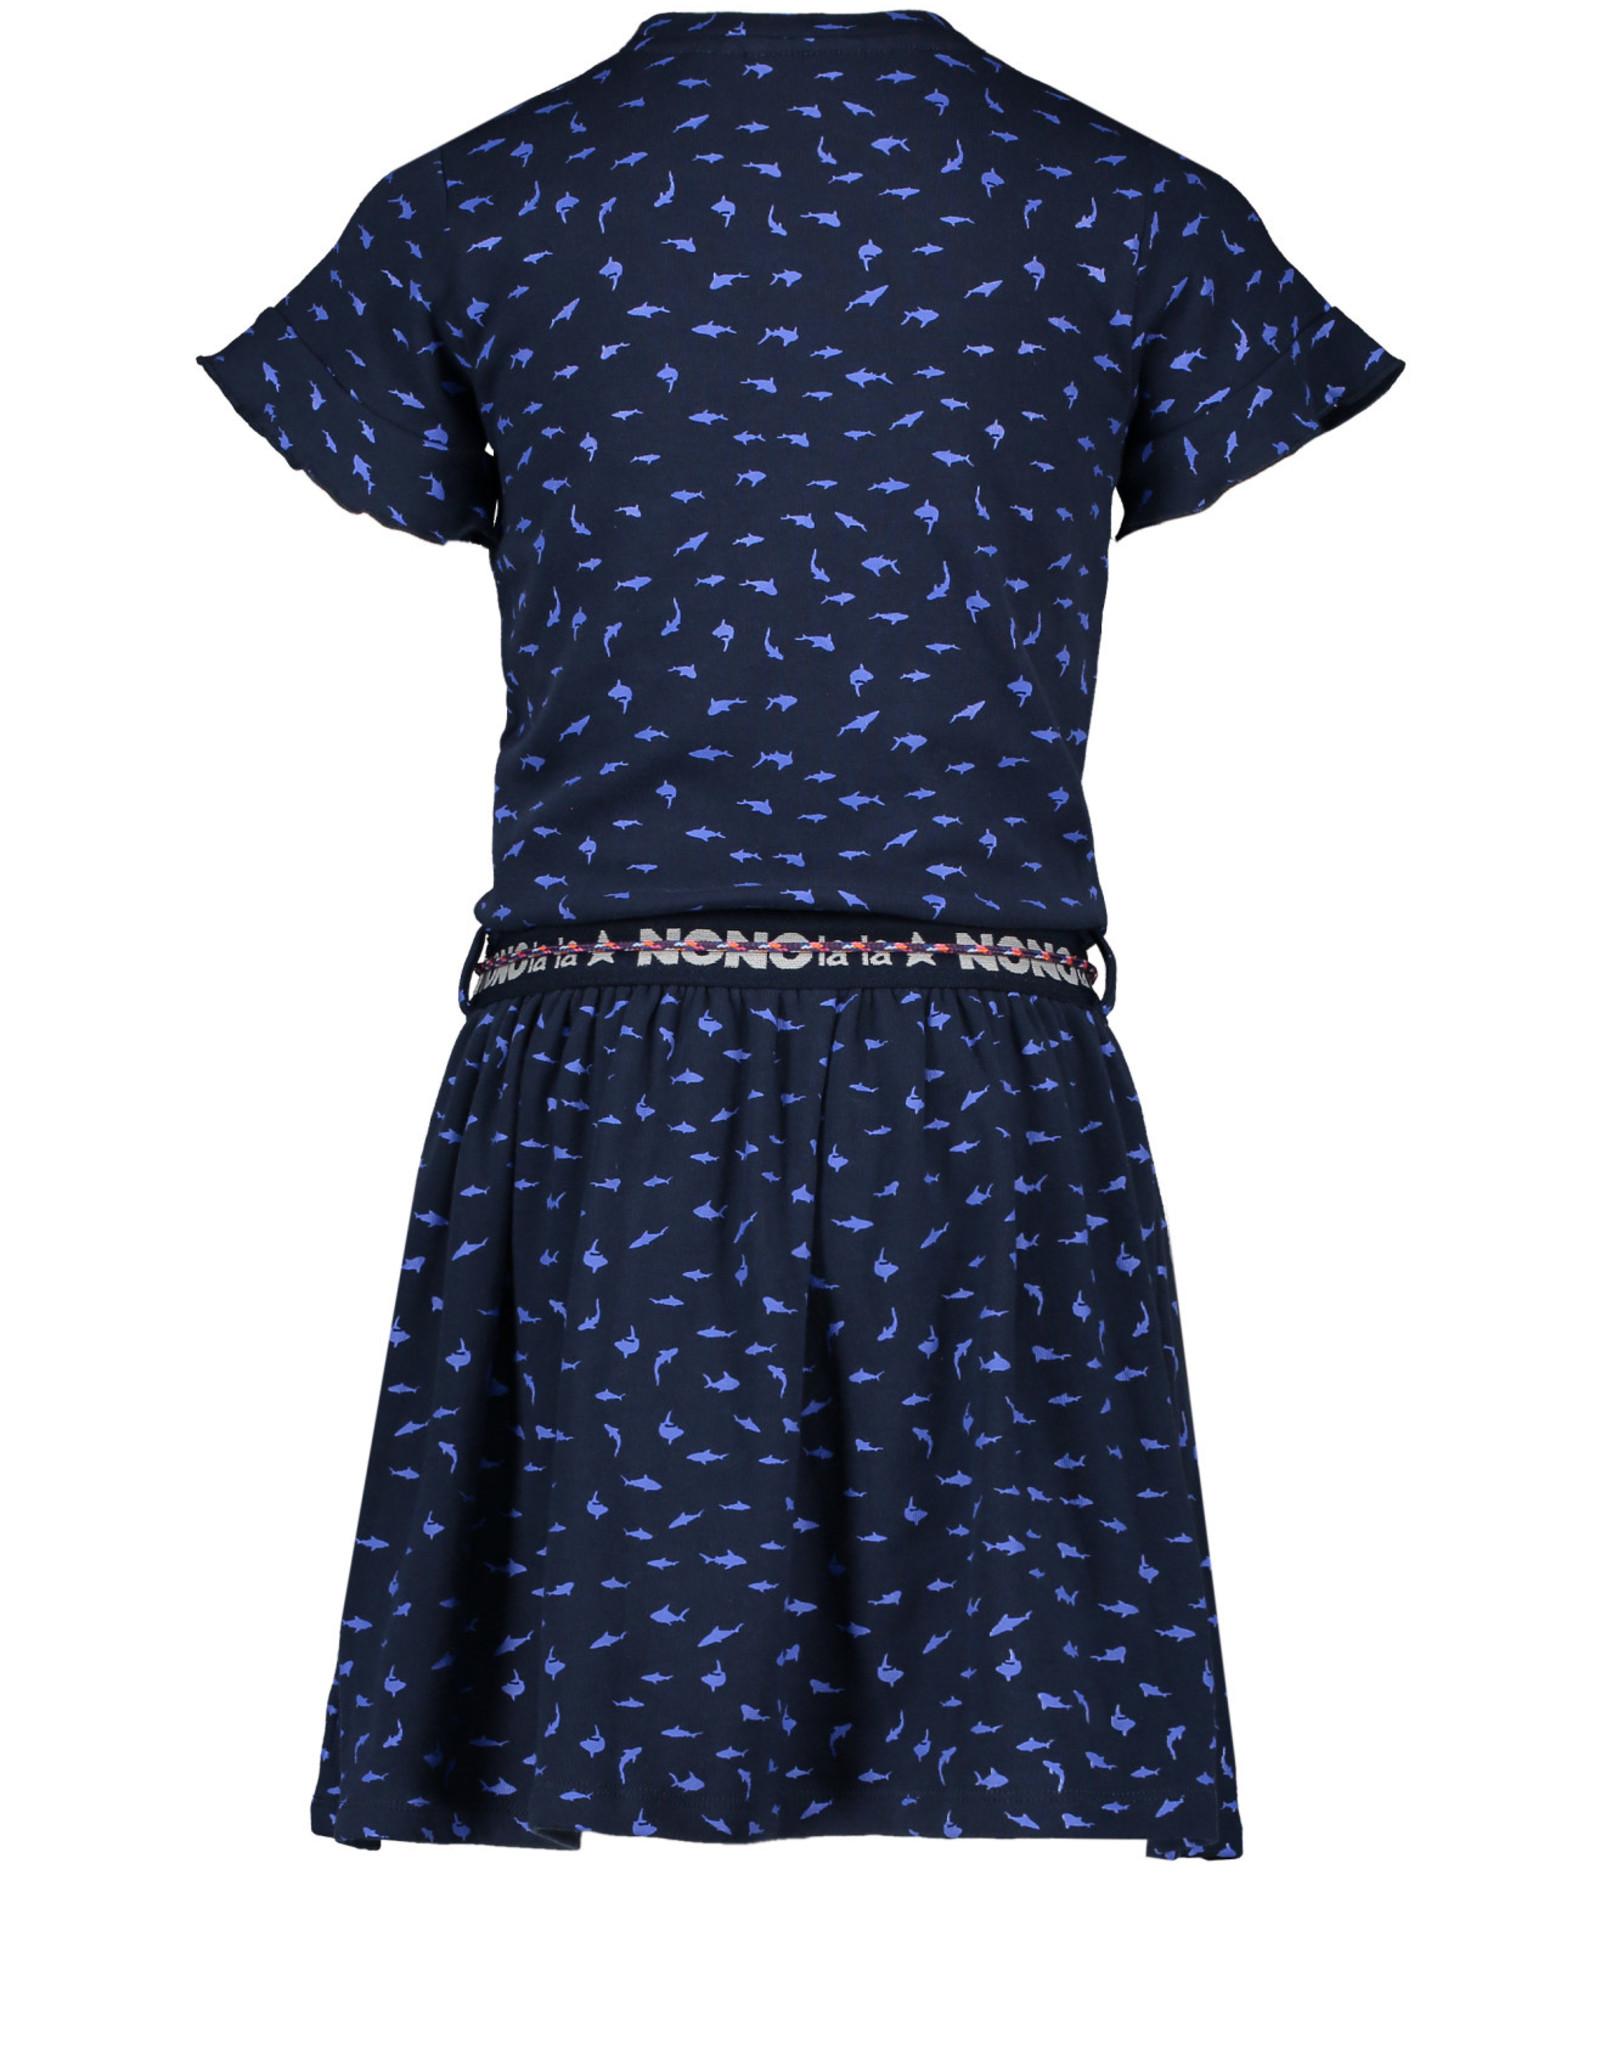 NONO Dress Navy w/ Blue Shark print elastic waist 5800